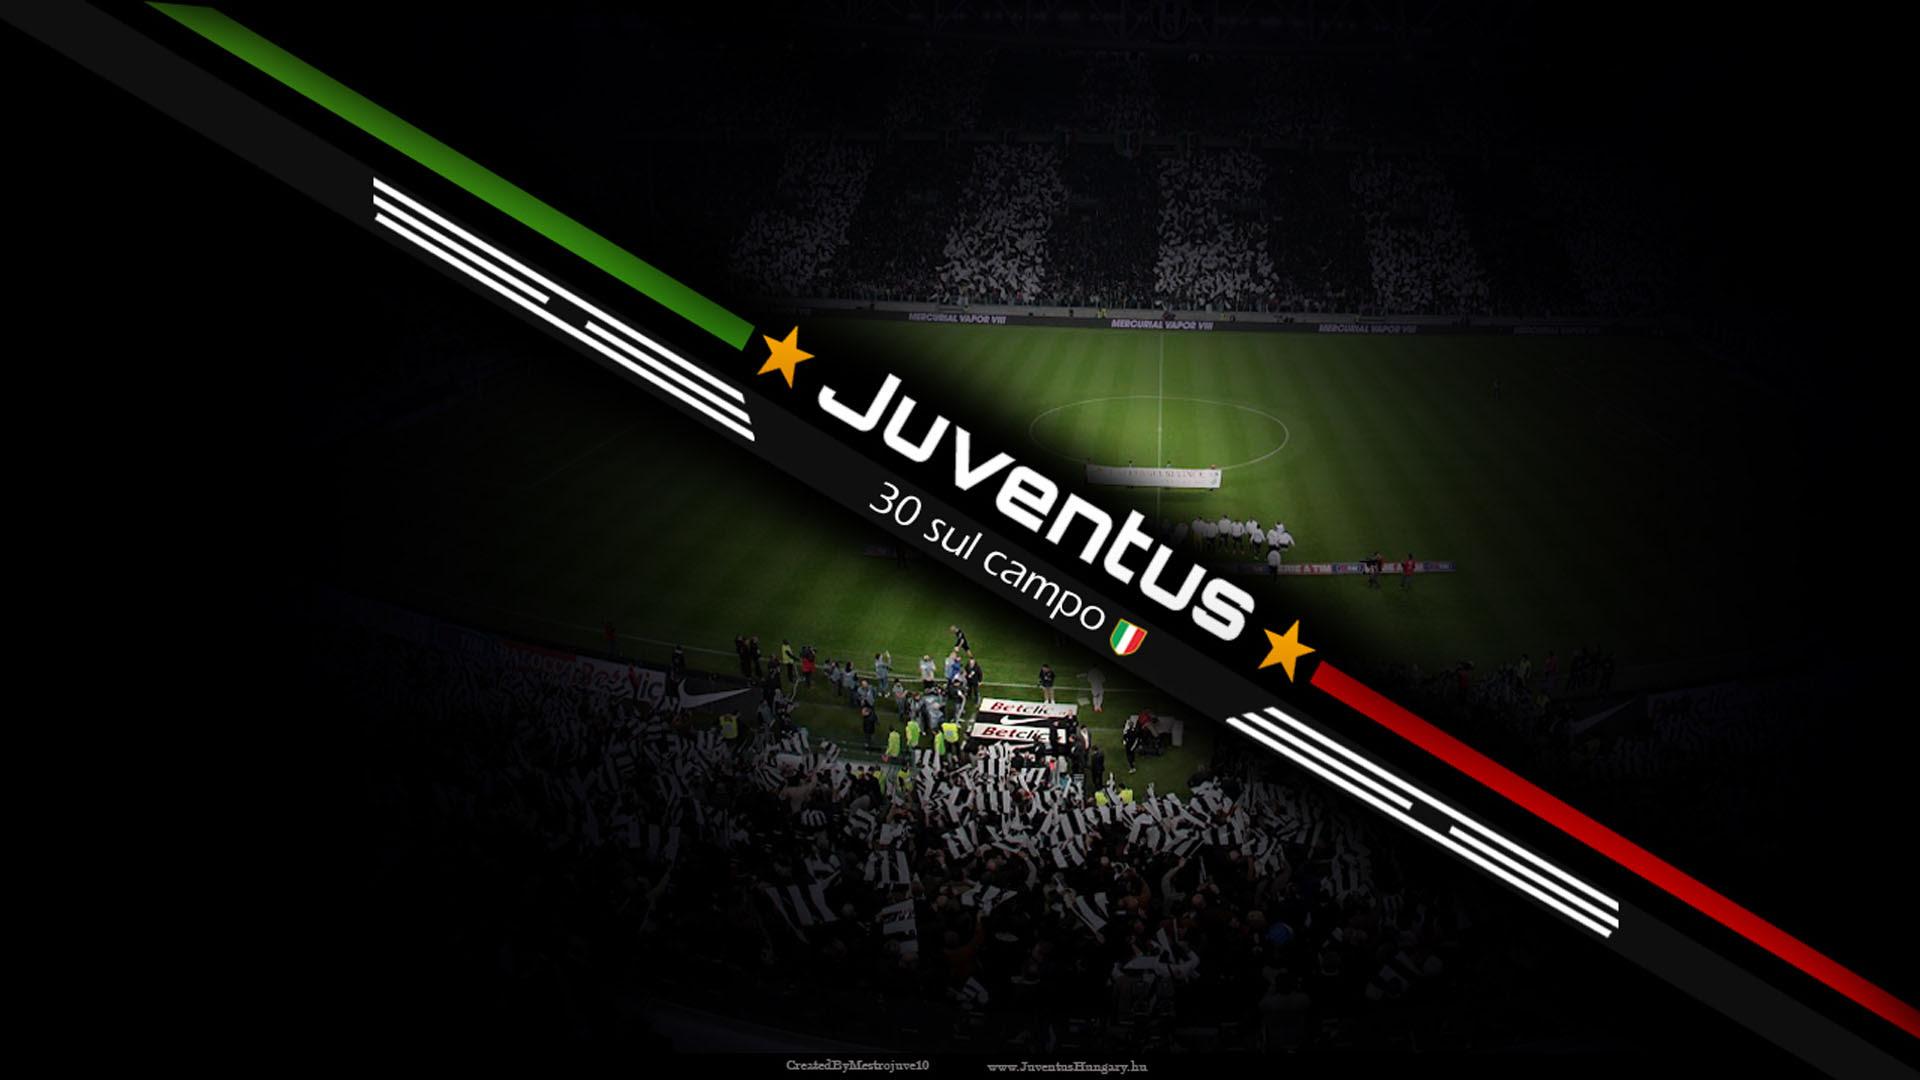 BEST WALLPAPER Juventus Wallpaper Pc